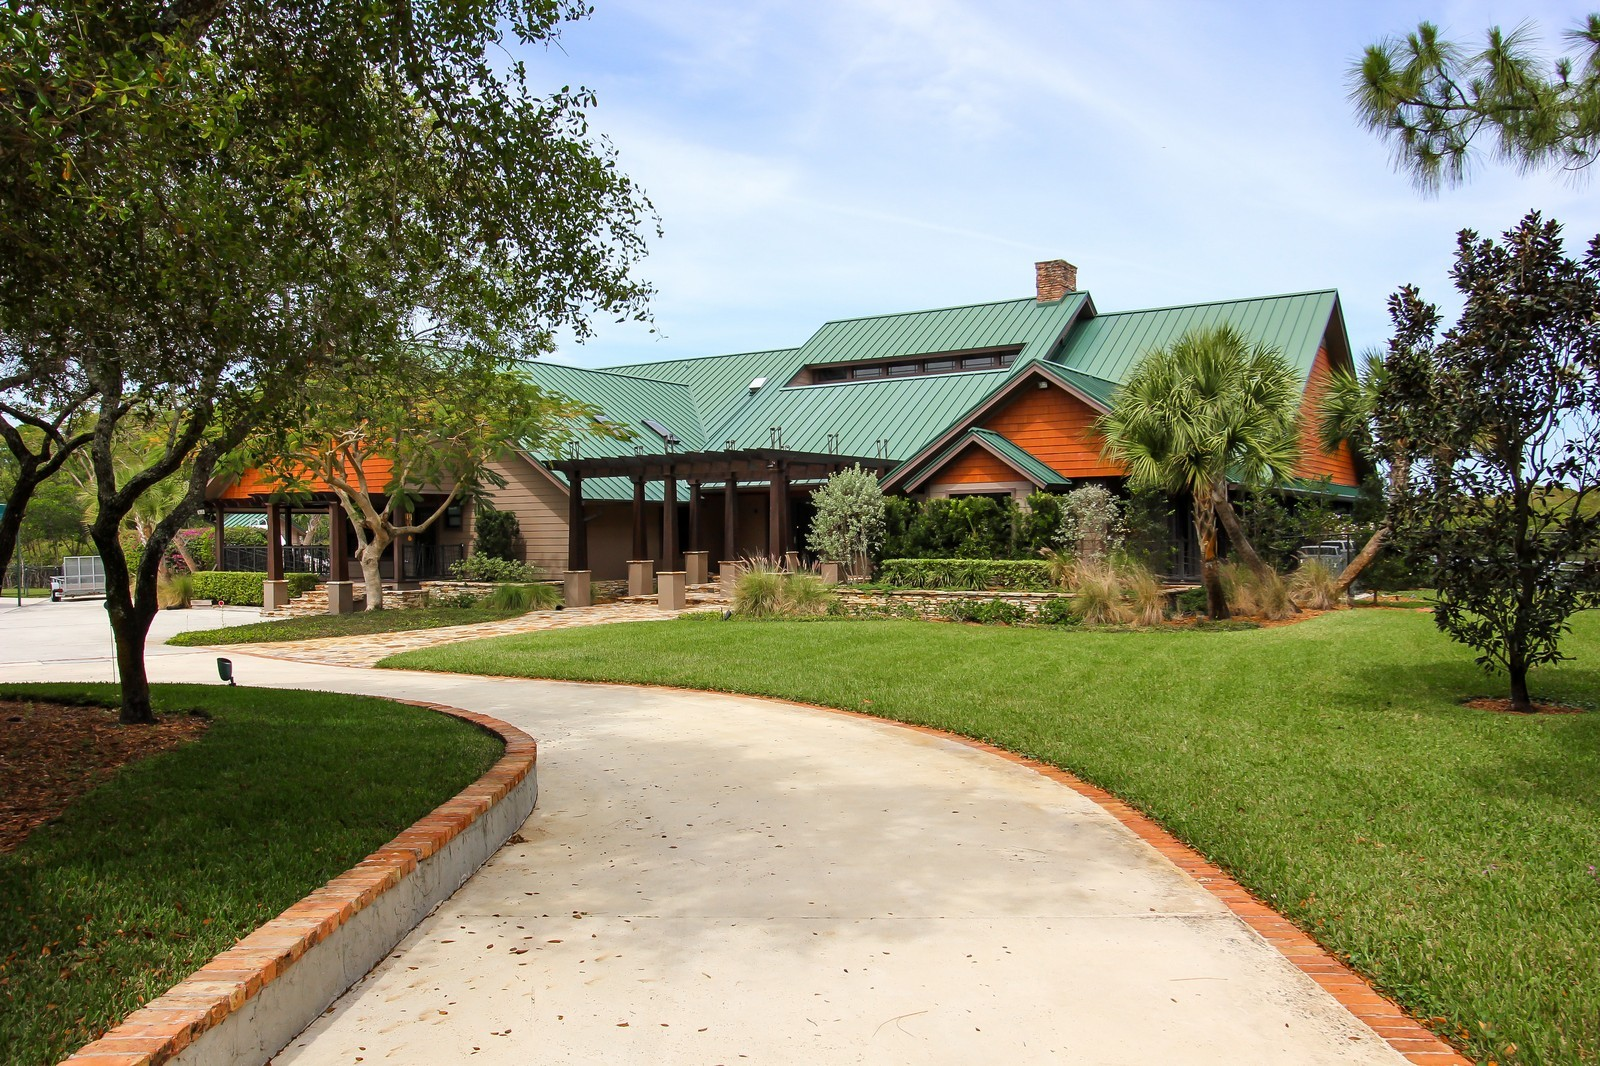 Real Estate Photography - 18300 SE Loxahatchee River Rd, Jupiter, FL, 33458 - Front View